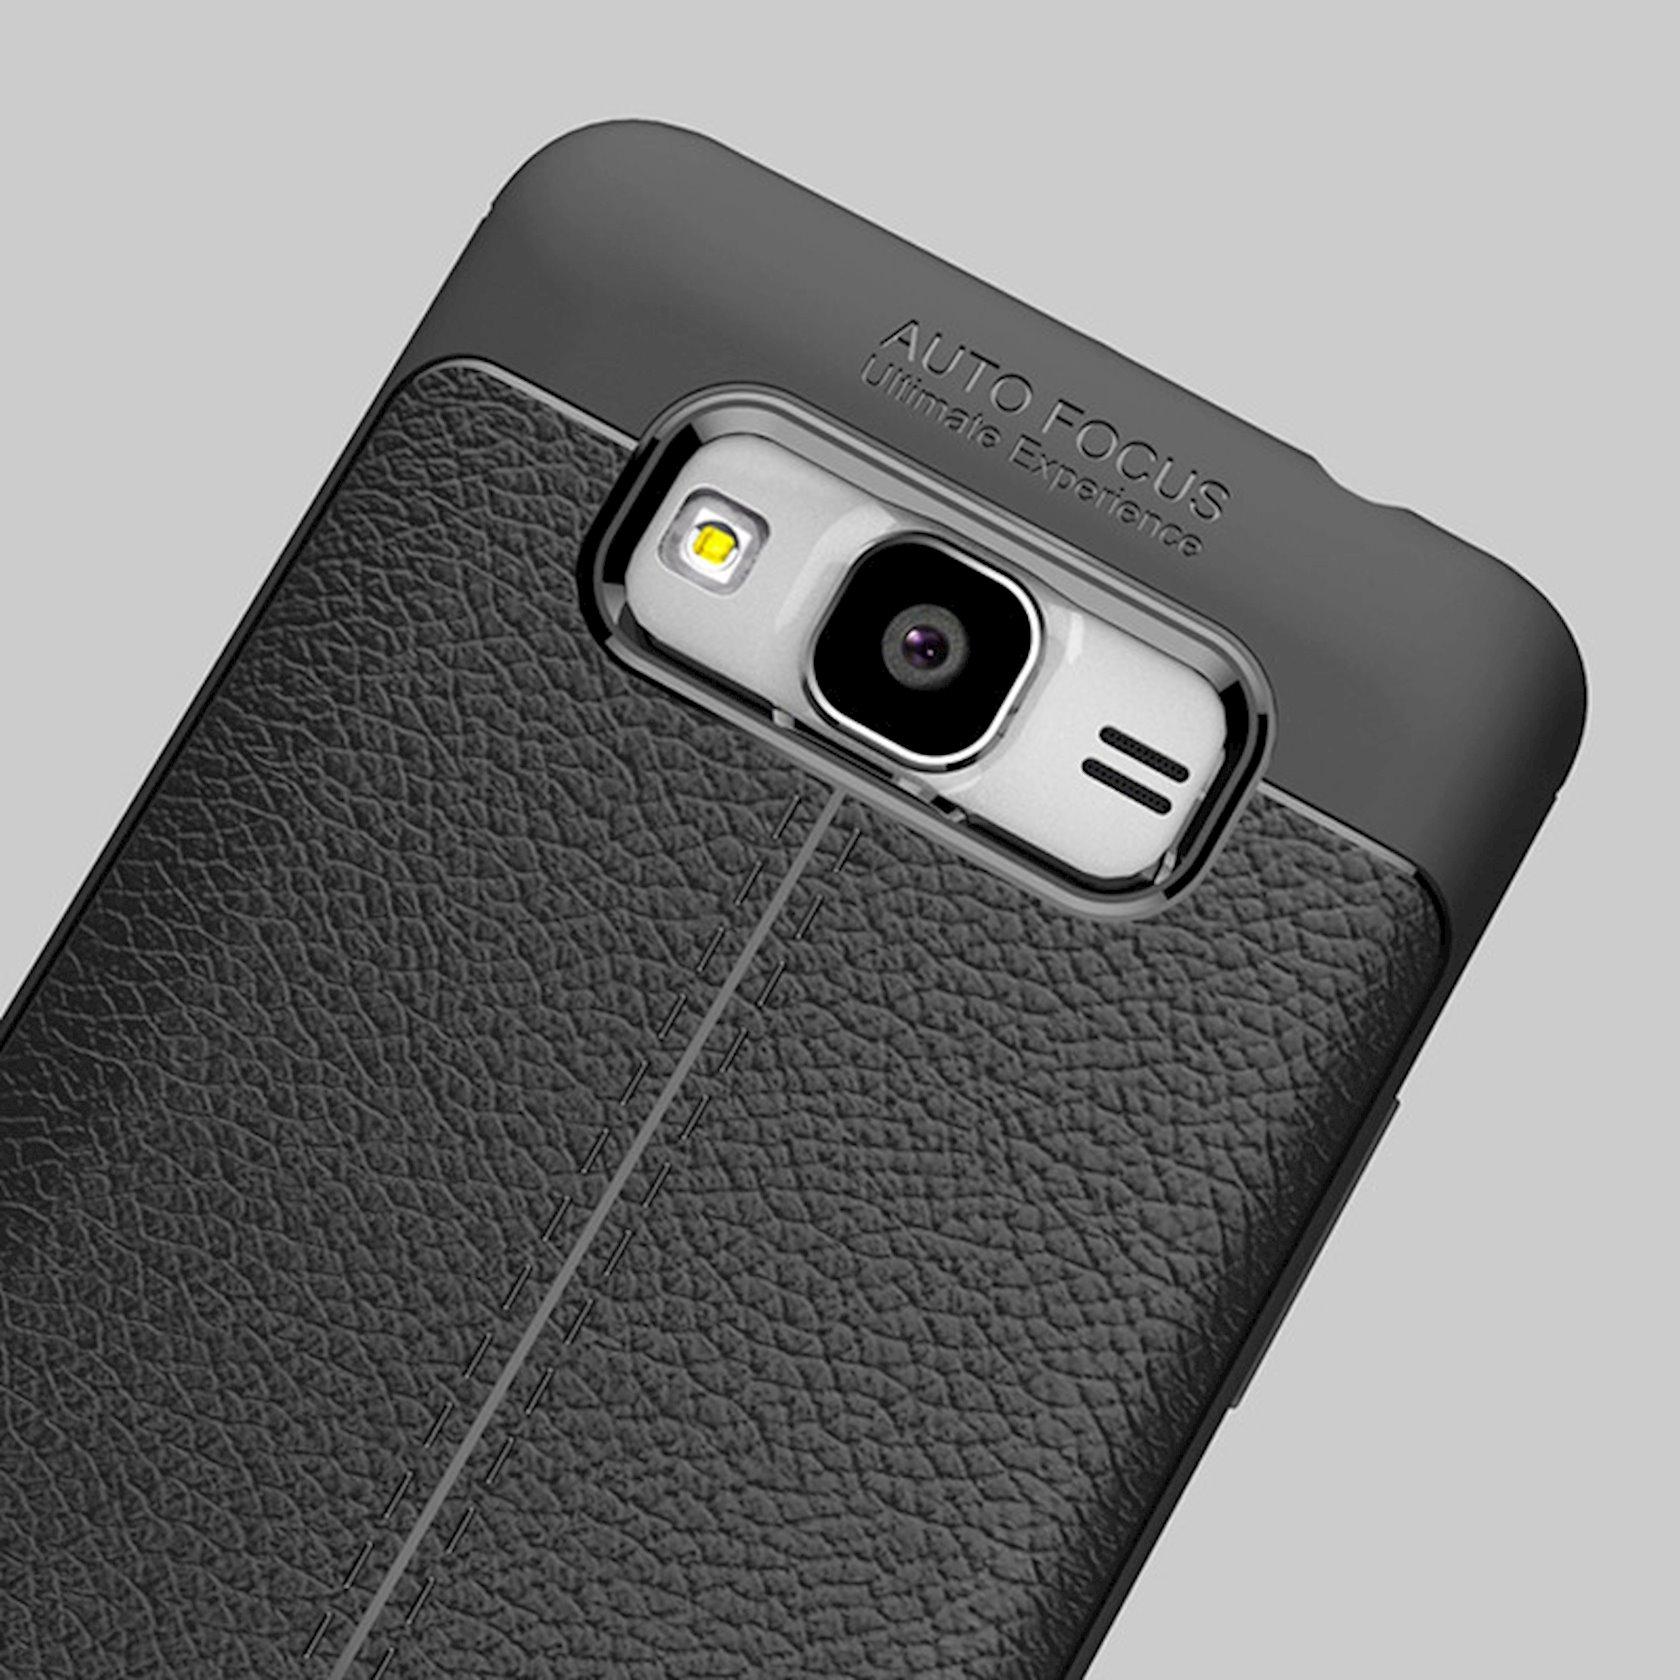 Çexol Autofocus Samsung Galaxy Grand Prime G530 üçün Black